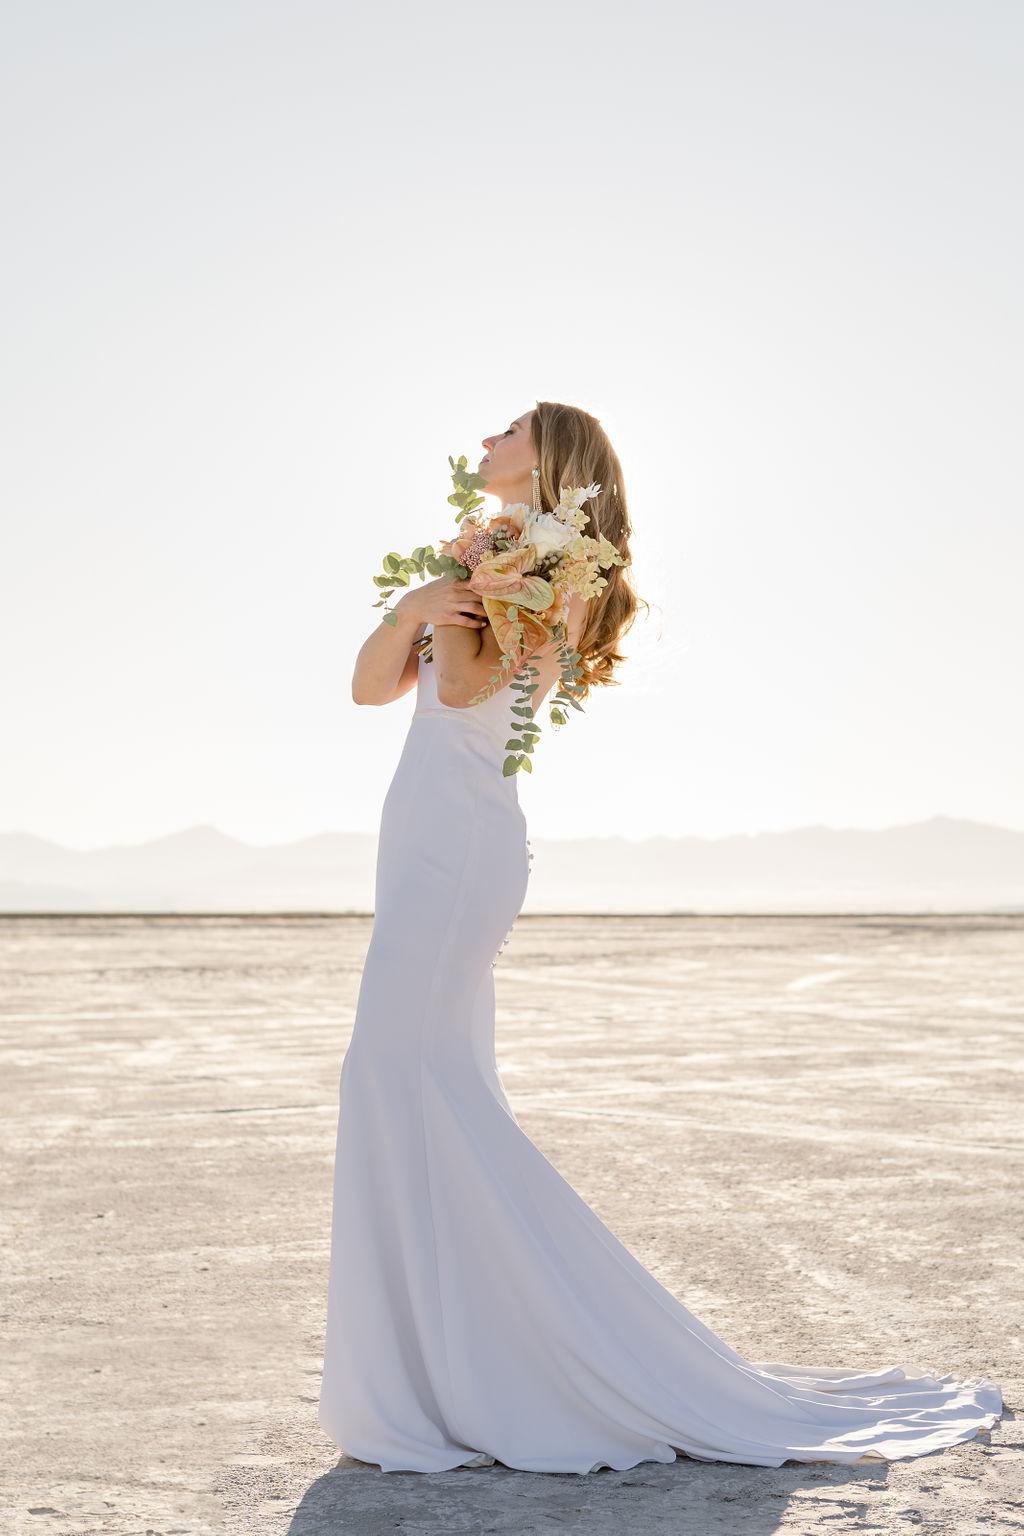 Simple Elegant Modern Goli June Brighton Wedding Dress Victoria Chukarov Salt Flats Utah 7